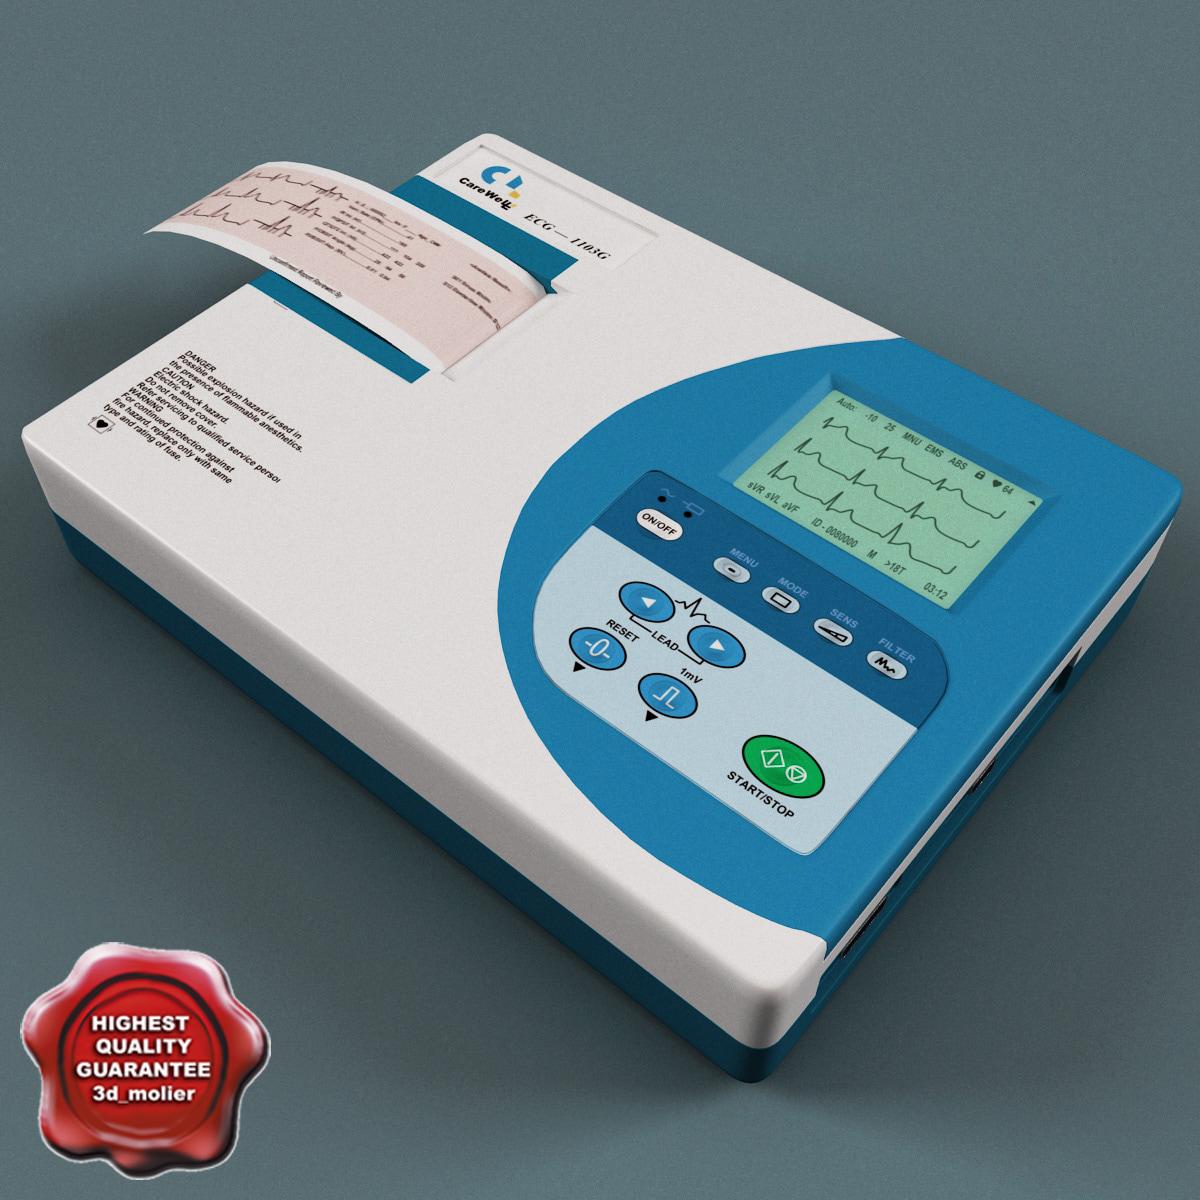 ECG_Machine_Electrocardiograph_CareWell_00.jpg